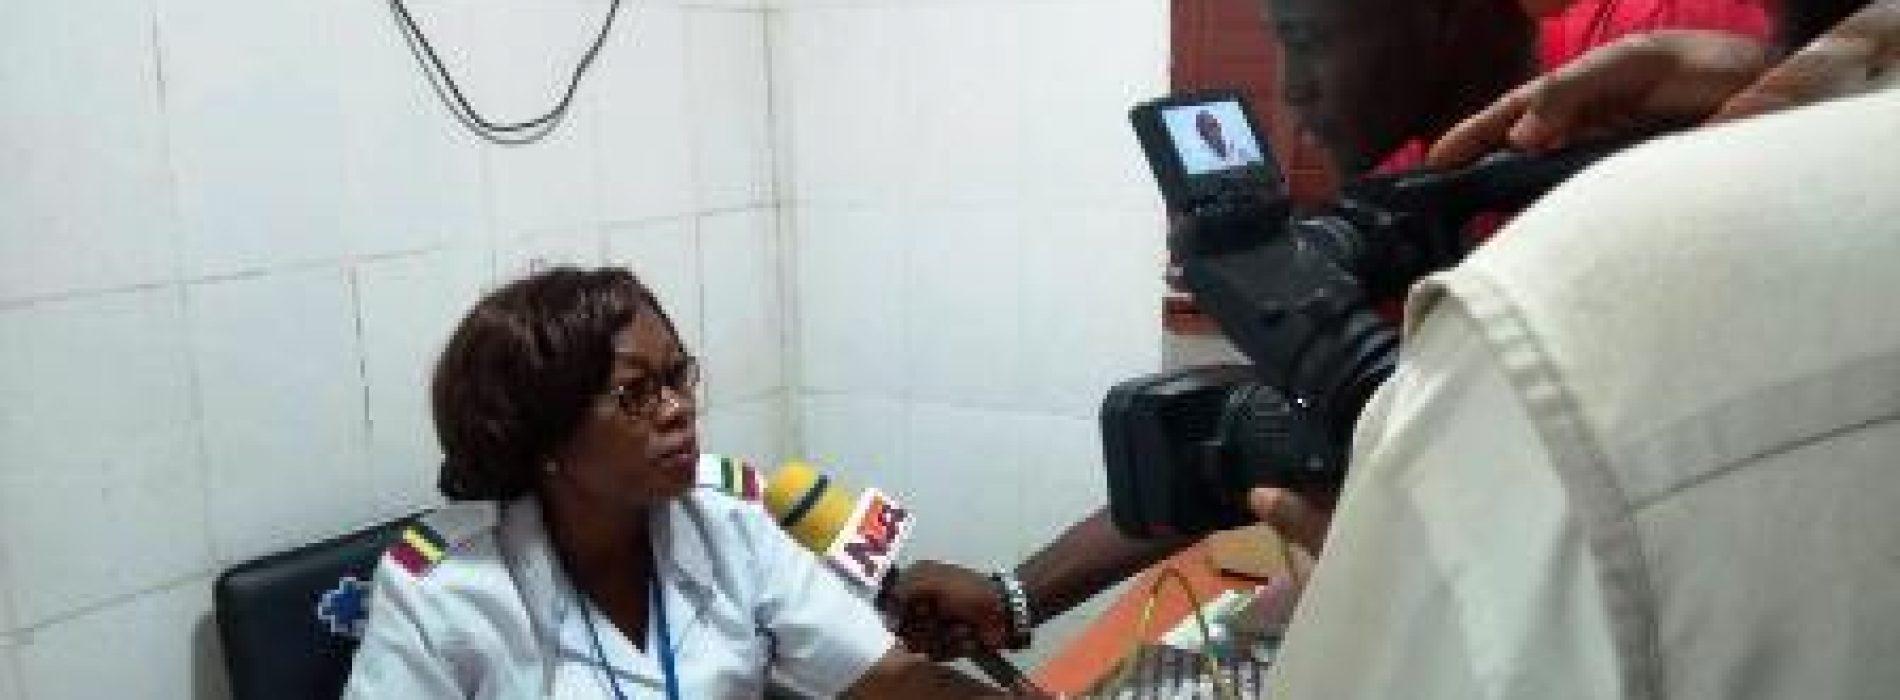 More women go for Family Planning in Lagos, new statistics reveal